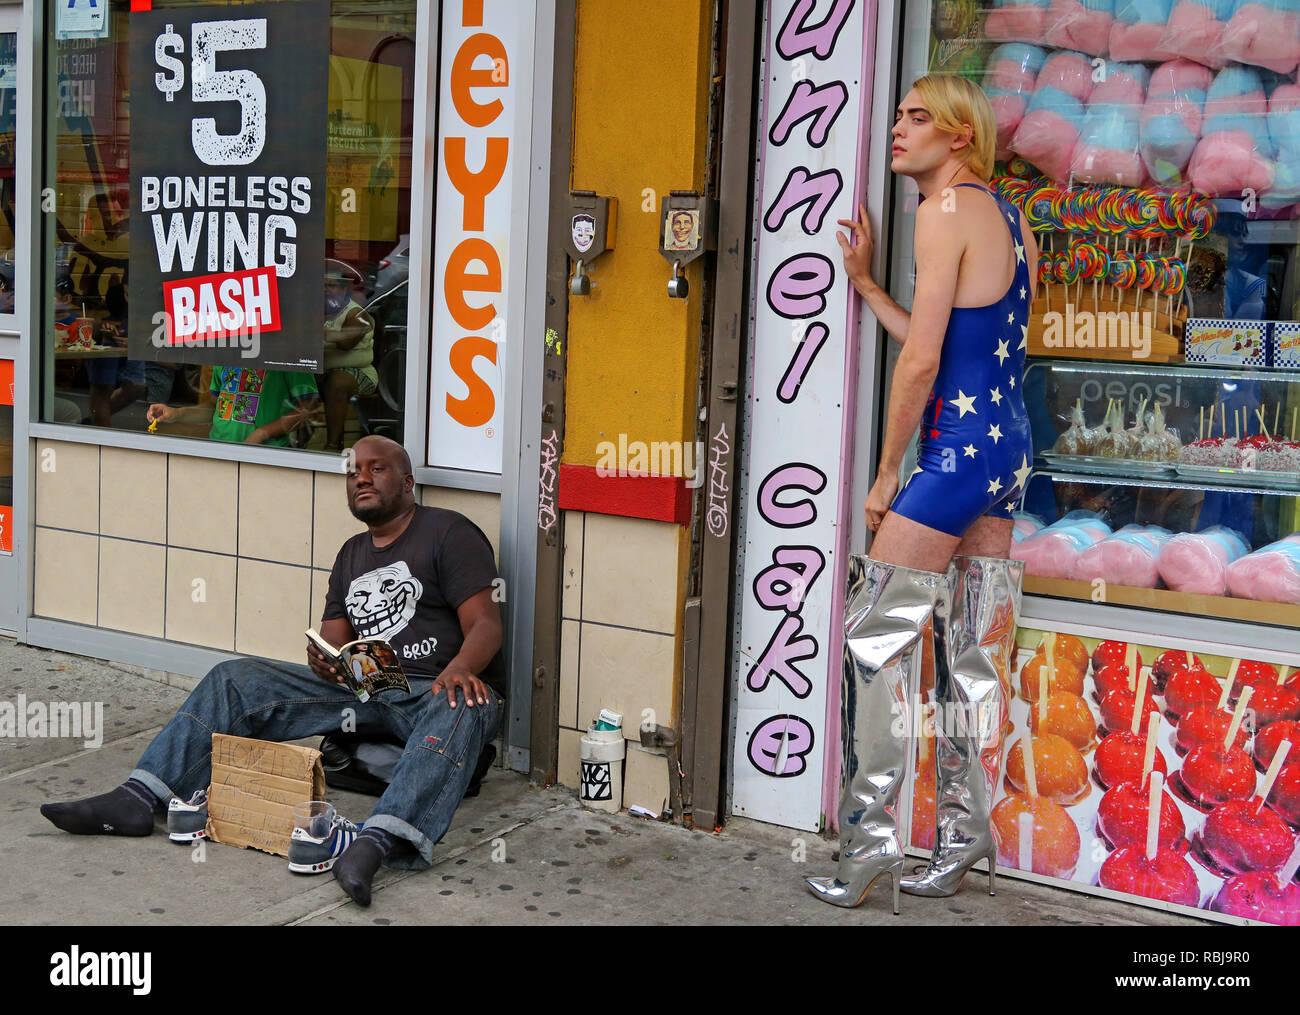 @HotpixUK,HotpixUK,GoTonySmith,NY,NYC,New York,New York City,Centre,City Centre,street,USA,United states of America,United States,Brooklyn,beach,resort,Borough Of Brooklyn,peninsular,leisure,entertainment,tourist,tourism,destination,run down,rundown,dilapidated,seaside resort,seaside,US,Fred Trump,Fred,Trump,Thor Equities,parks,NYC Parks,old,artists,bum,tramp,begging